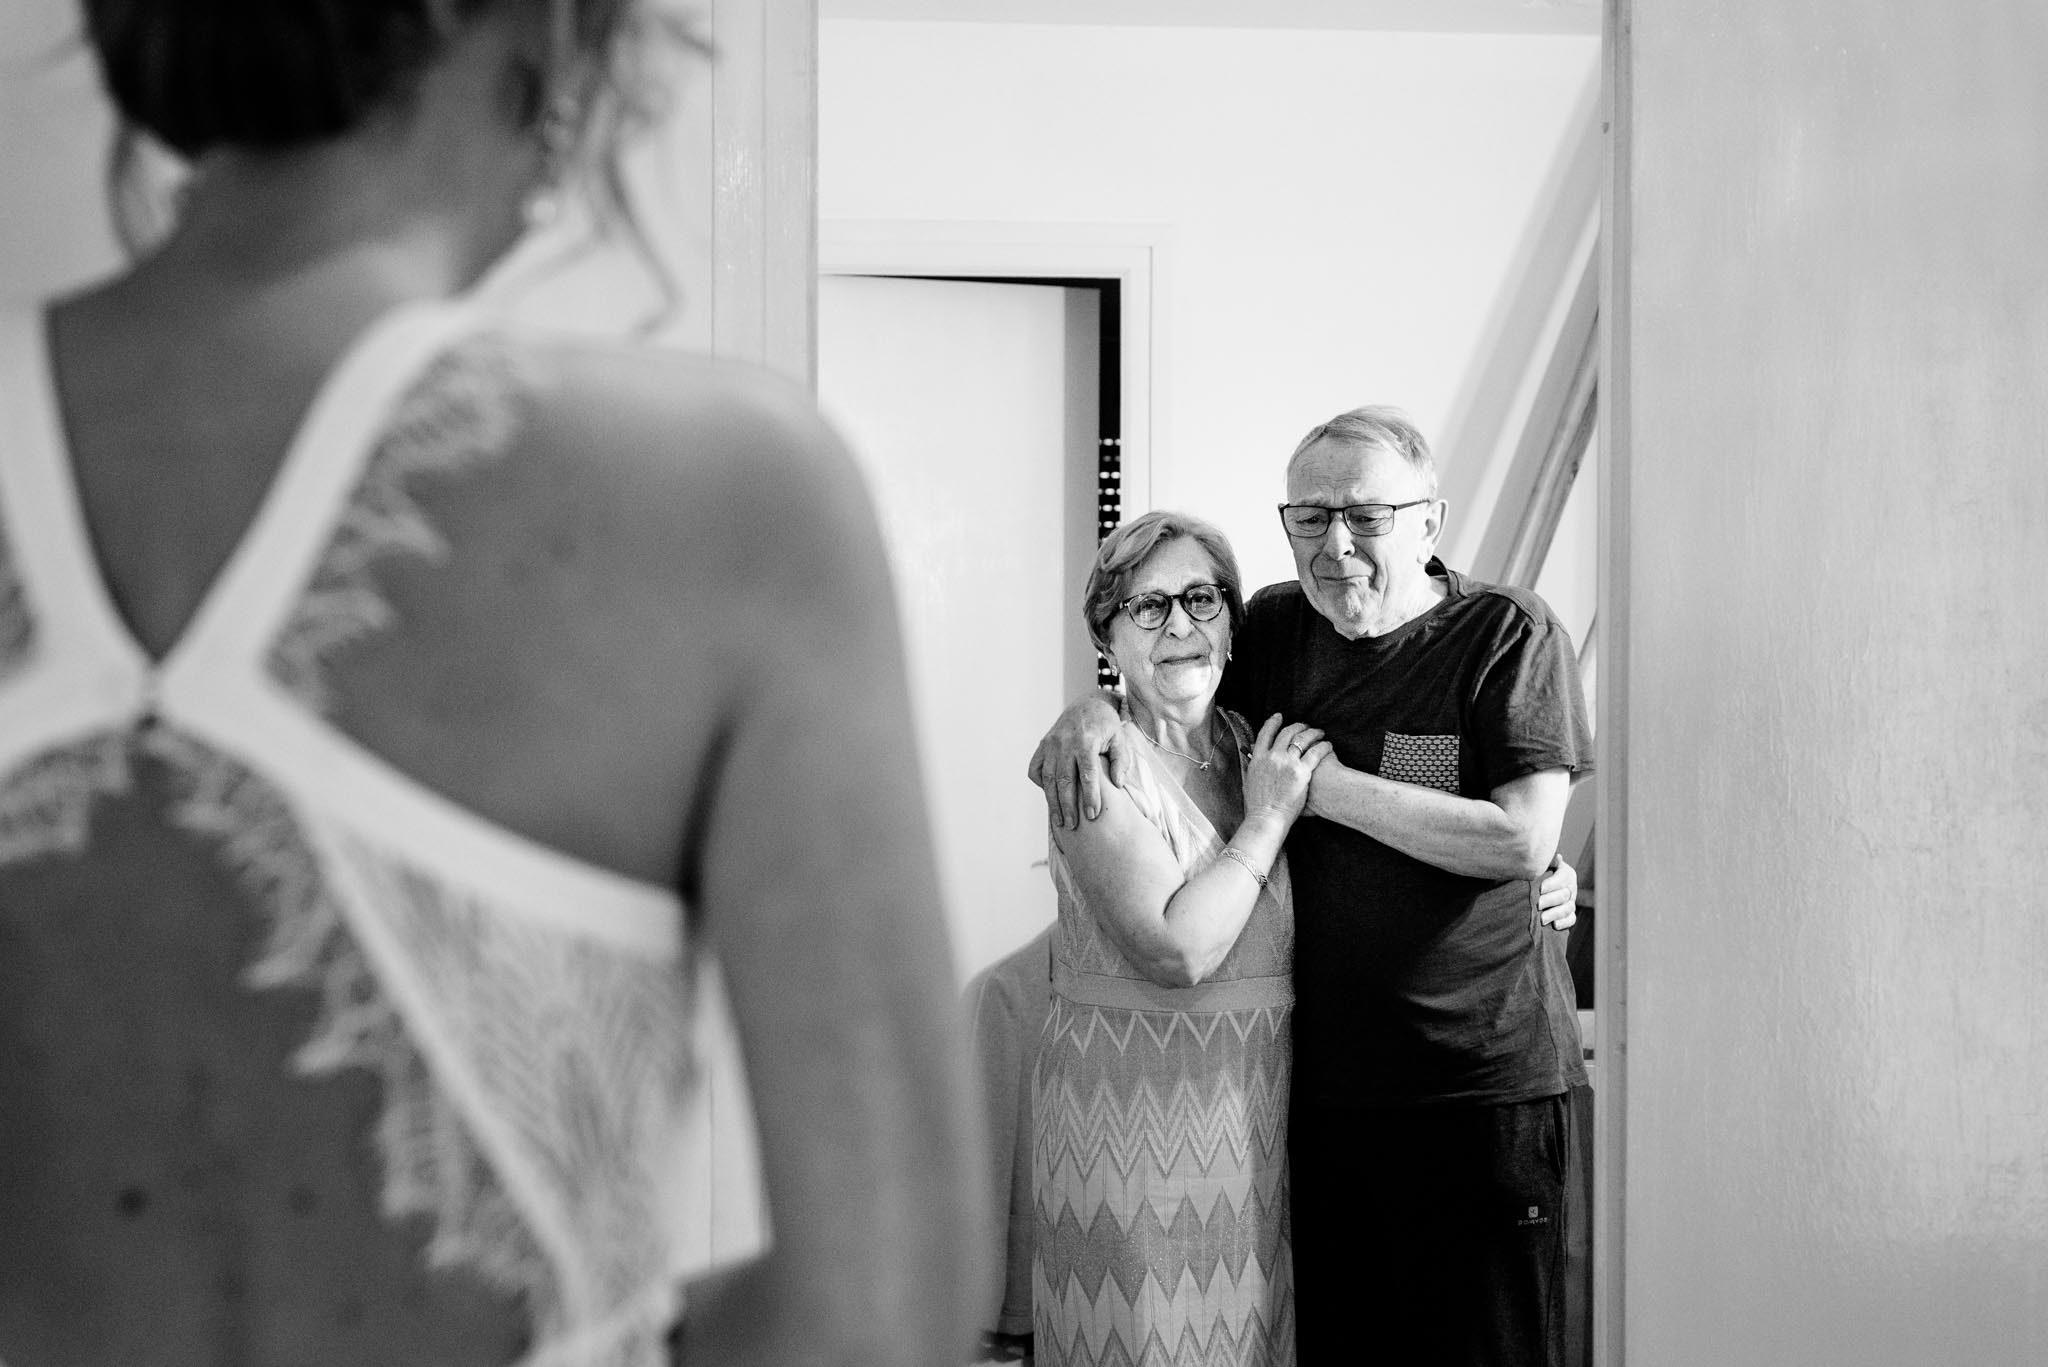 bodas bonitas en barcelona tarragona spain wedding photograpger - laura arroyo fotografos vilanova i la geltru